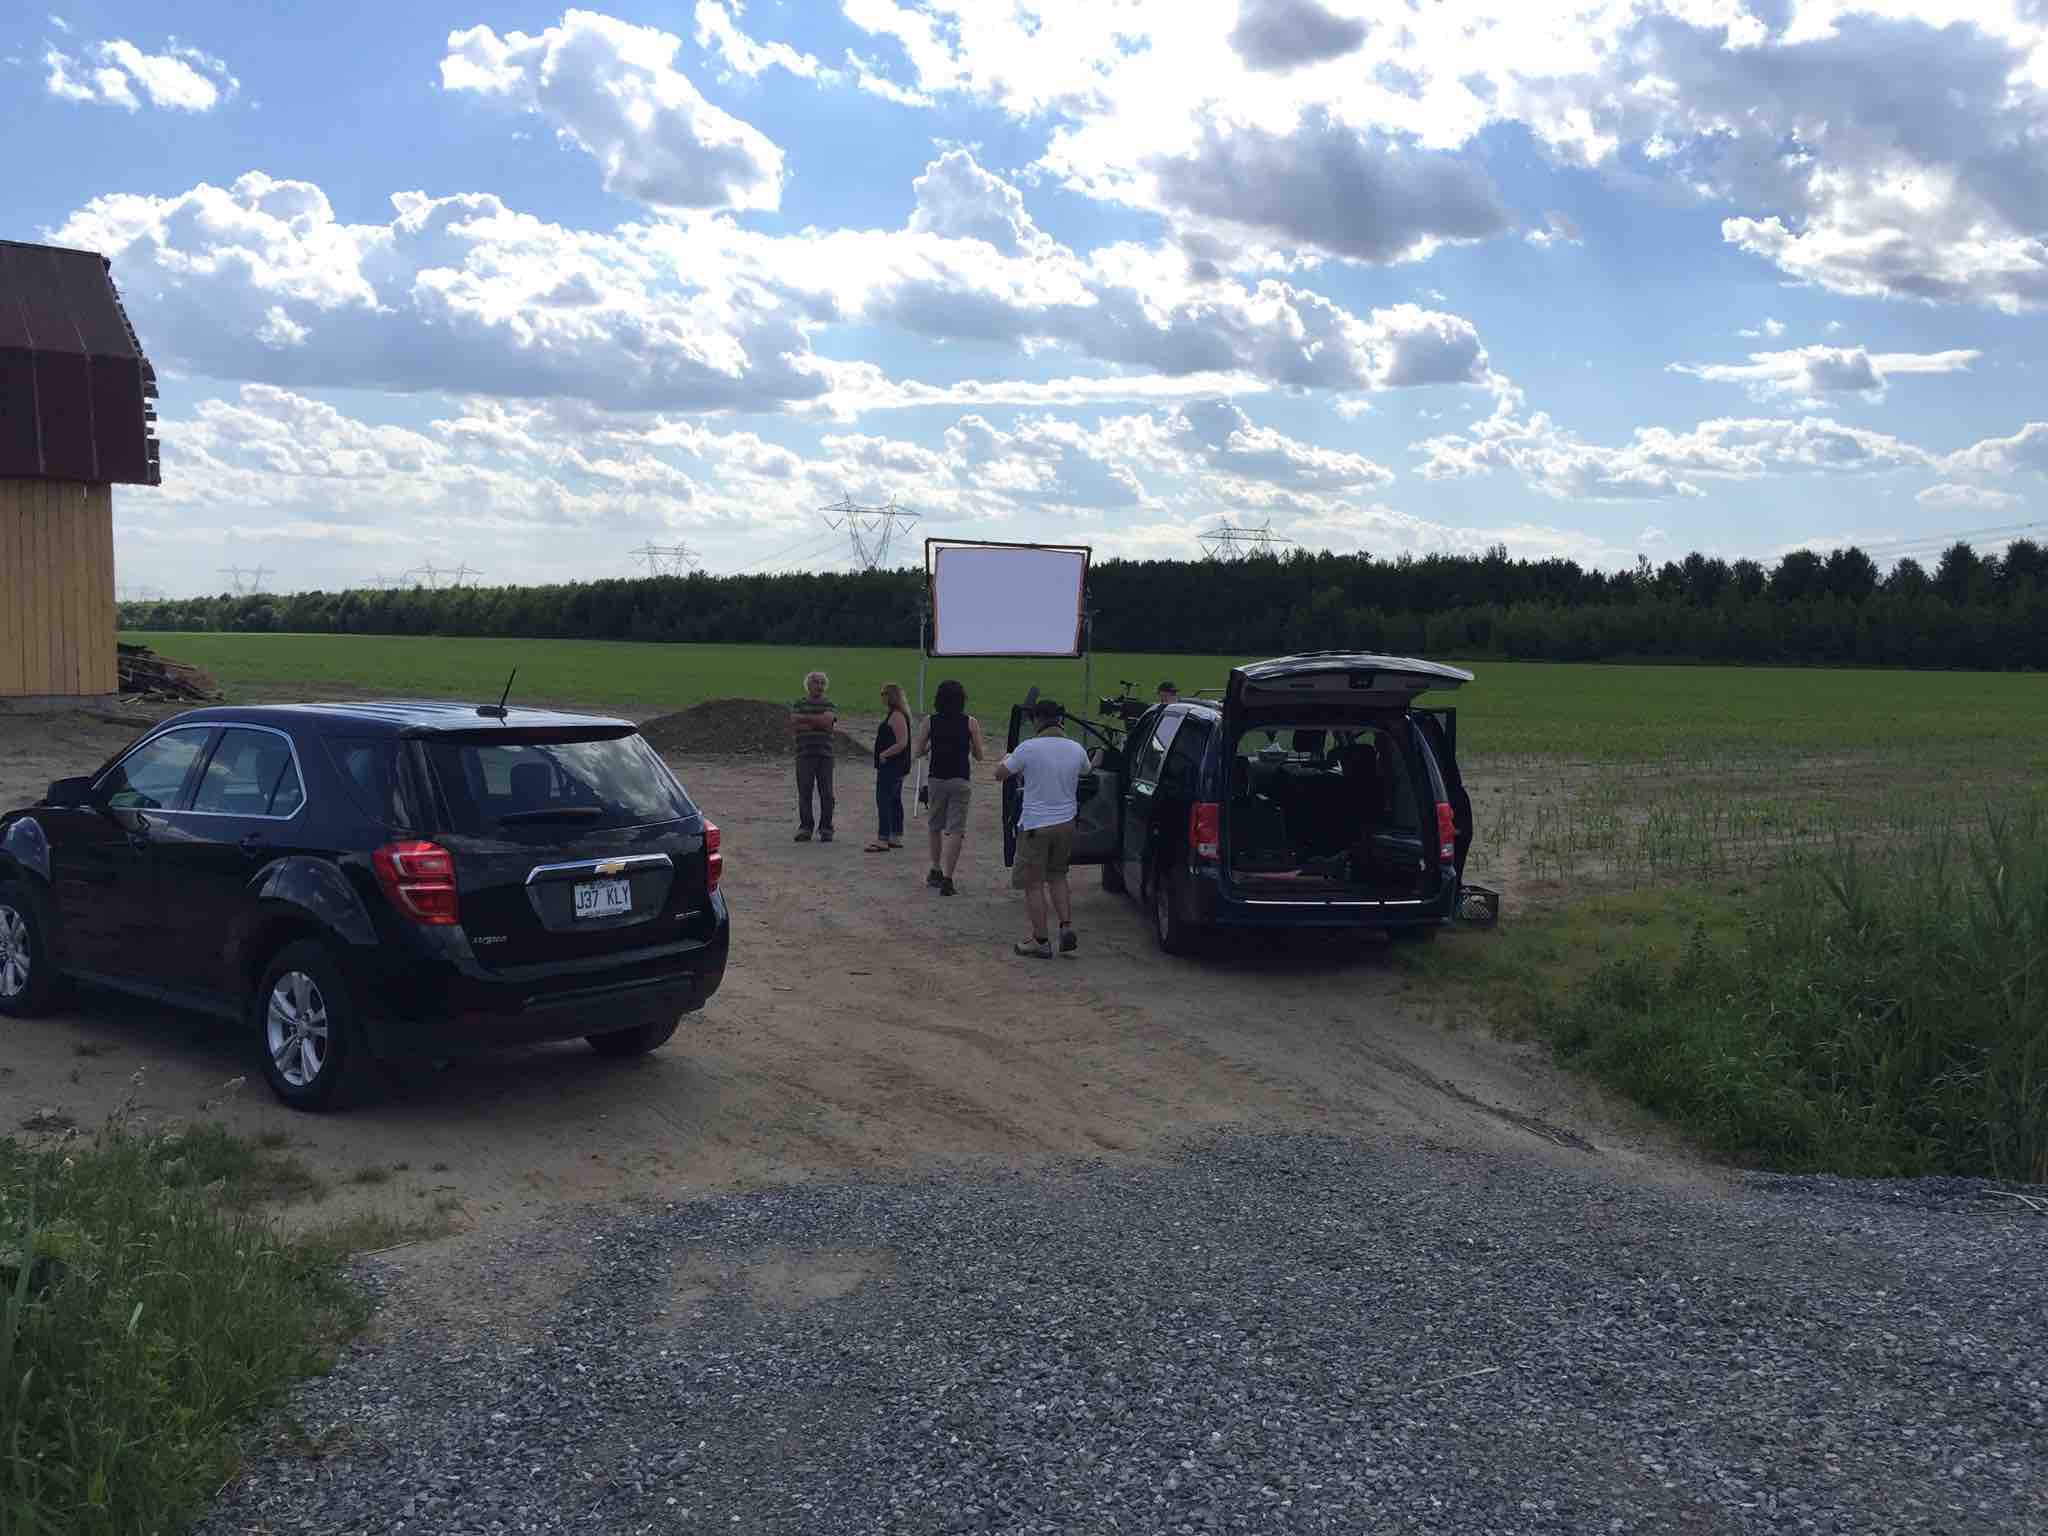 tournage-st-hyacinthe-dizifilms-1